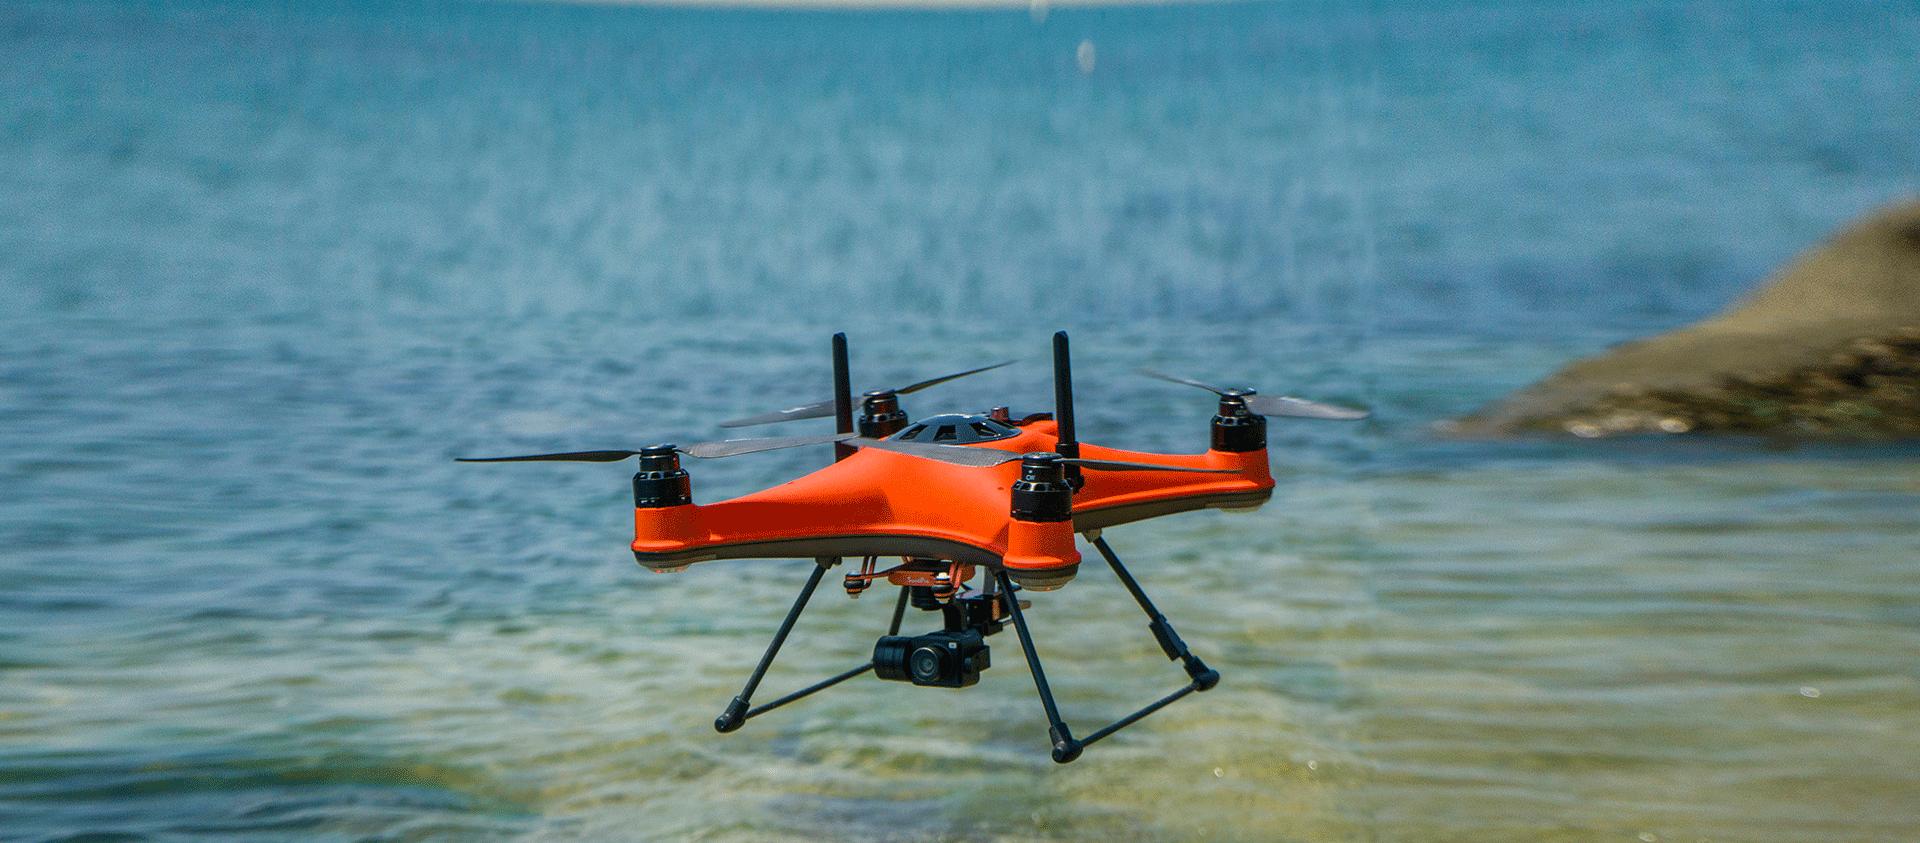 SwellPro SplashDrone 4 - multi-functional waterproof flight platform